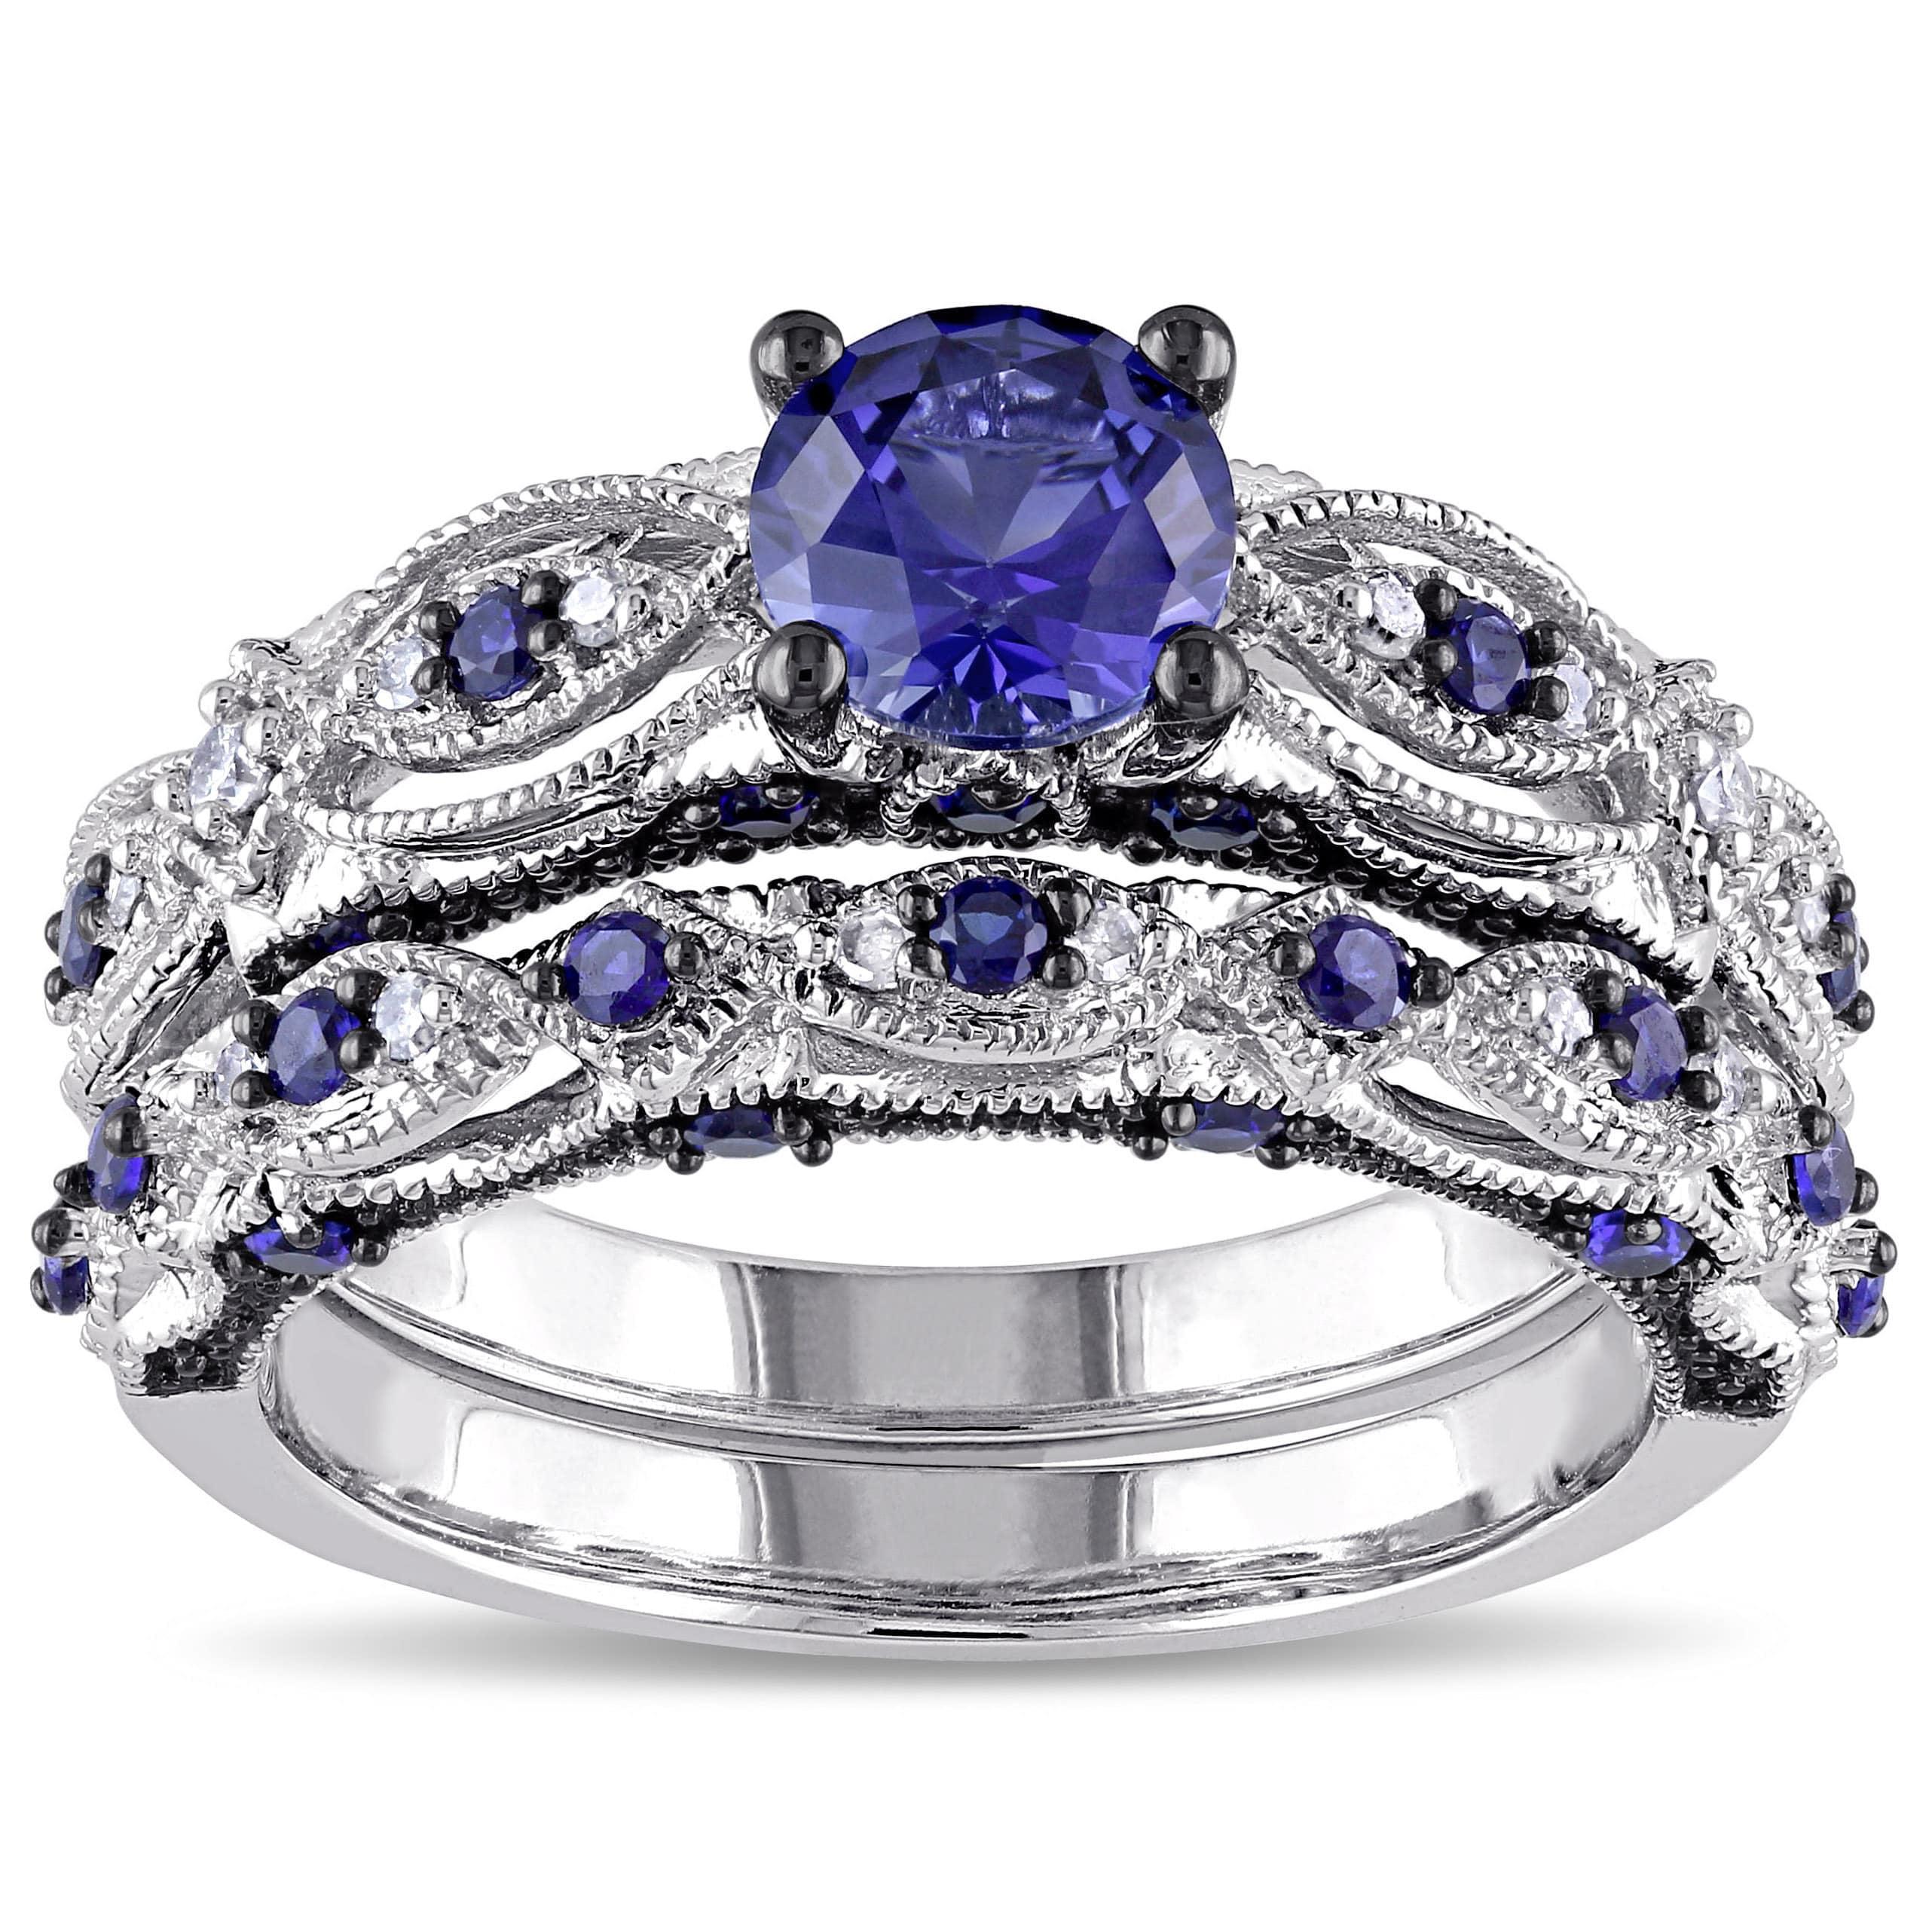 Size 7 Vintage Blue Sapphire Wedding Ring Women/'s 10KT Gold Rhodium Jewelry